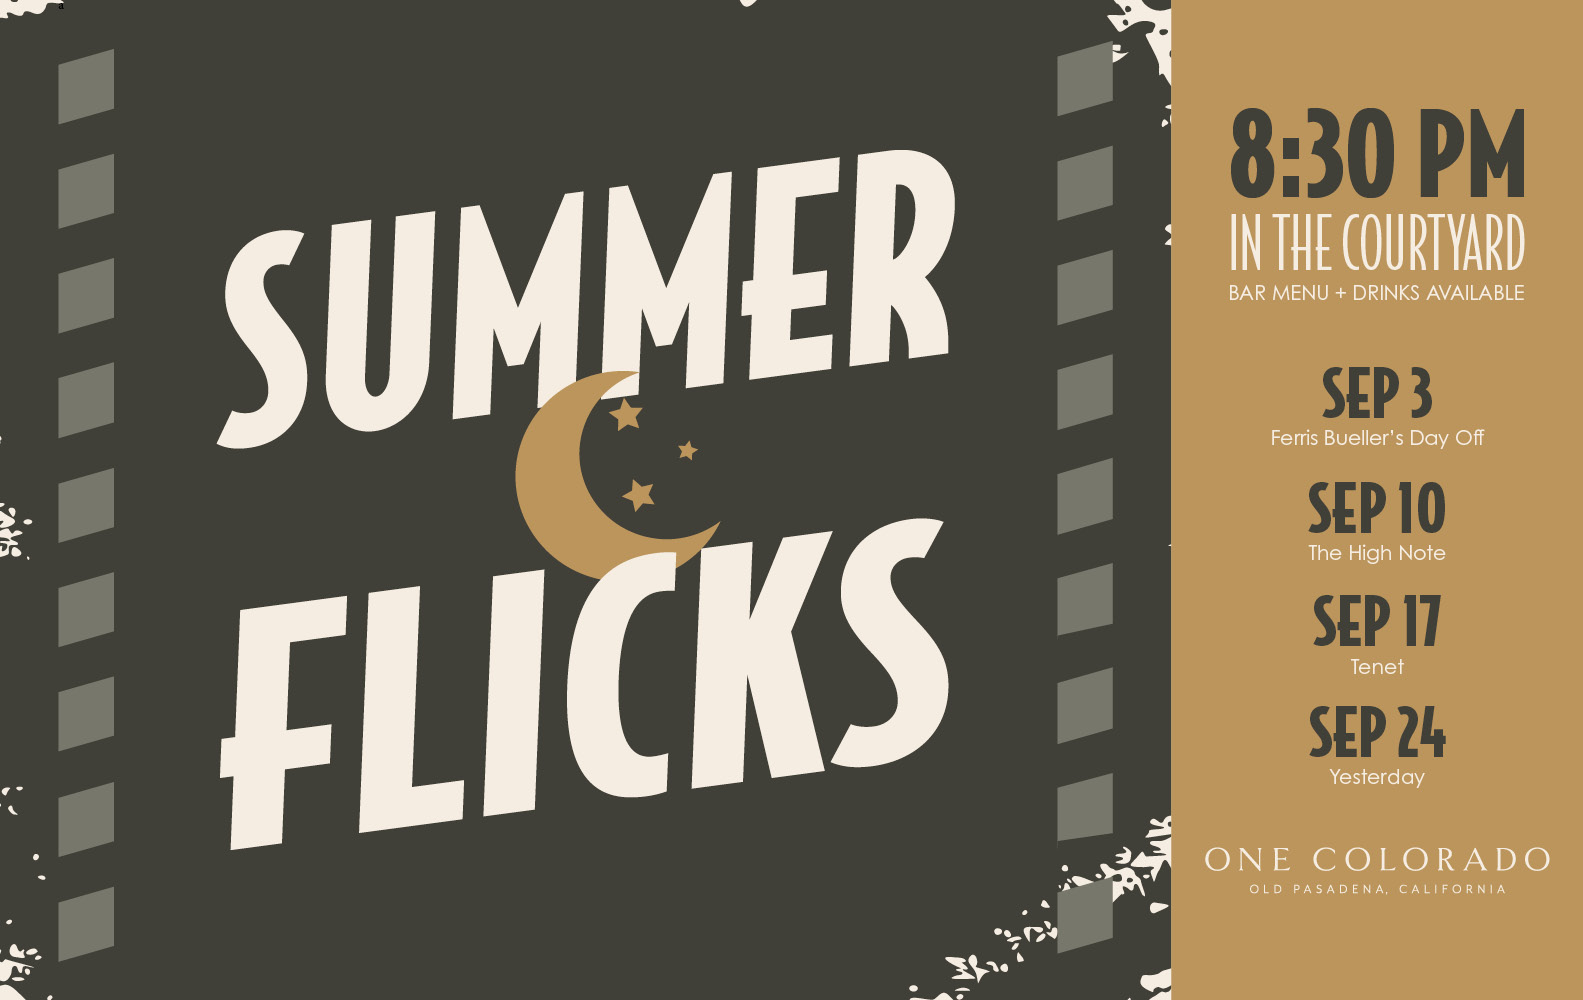 Summer Flicks at one colorado